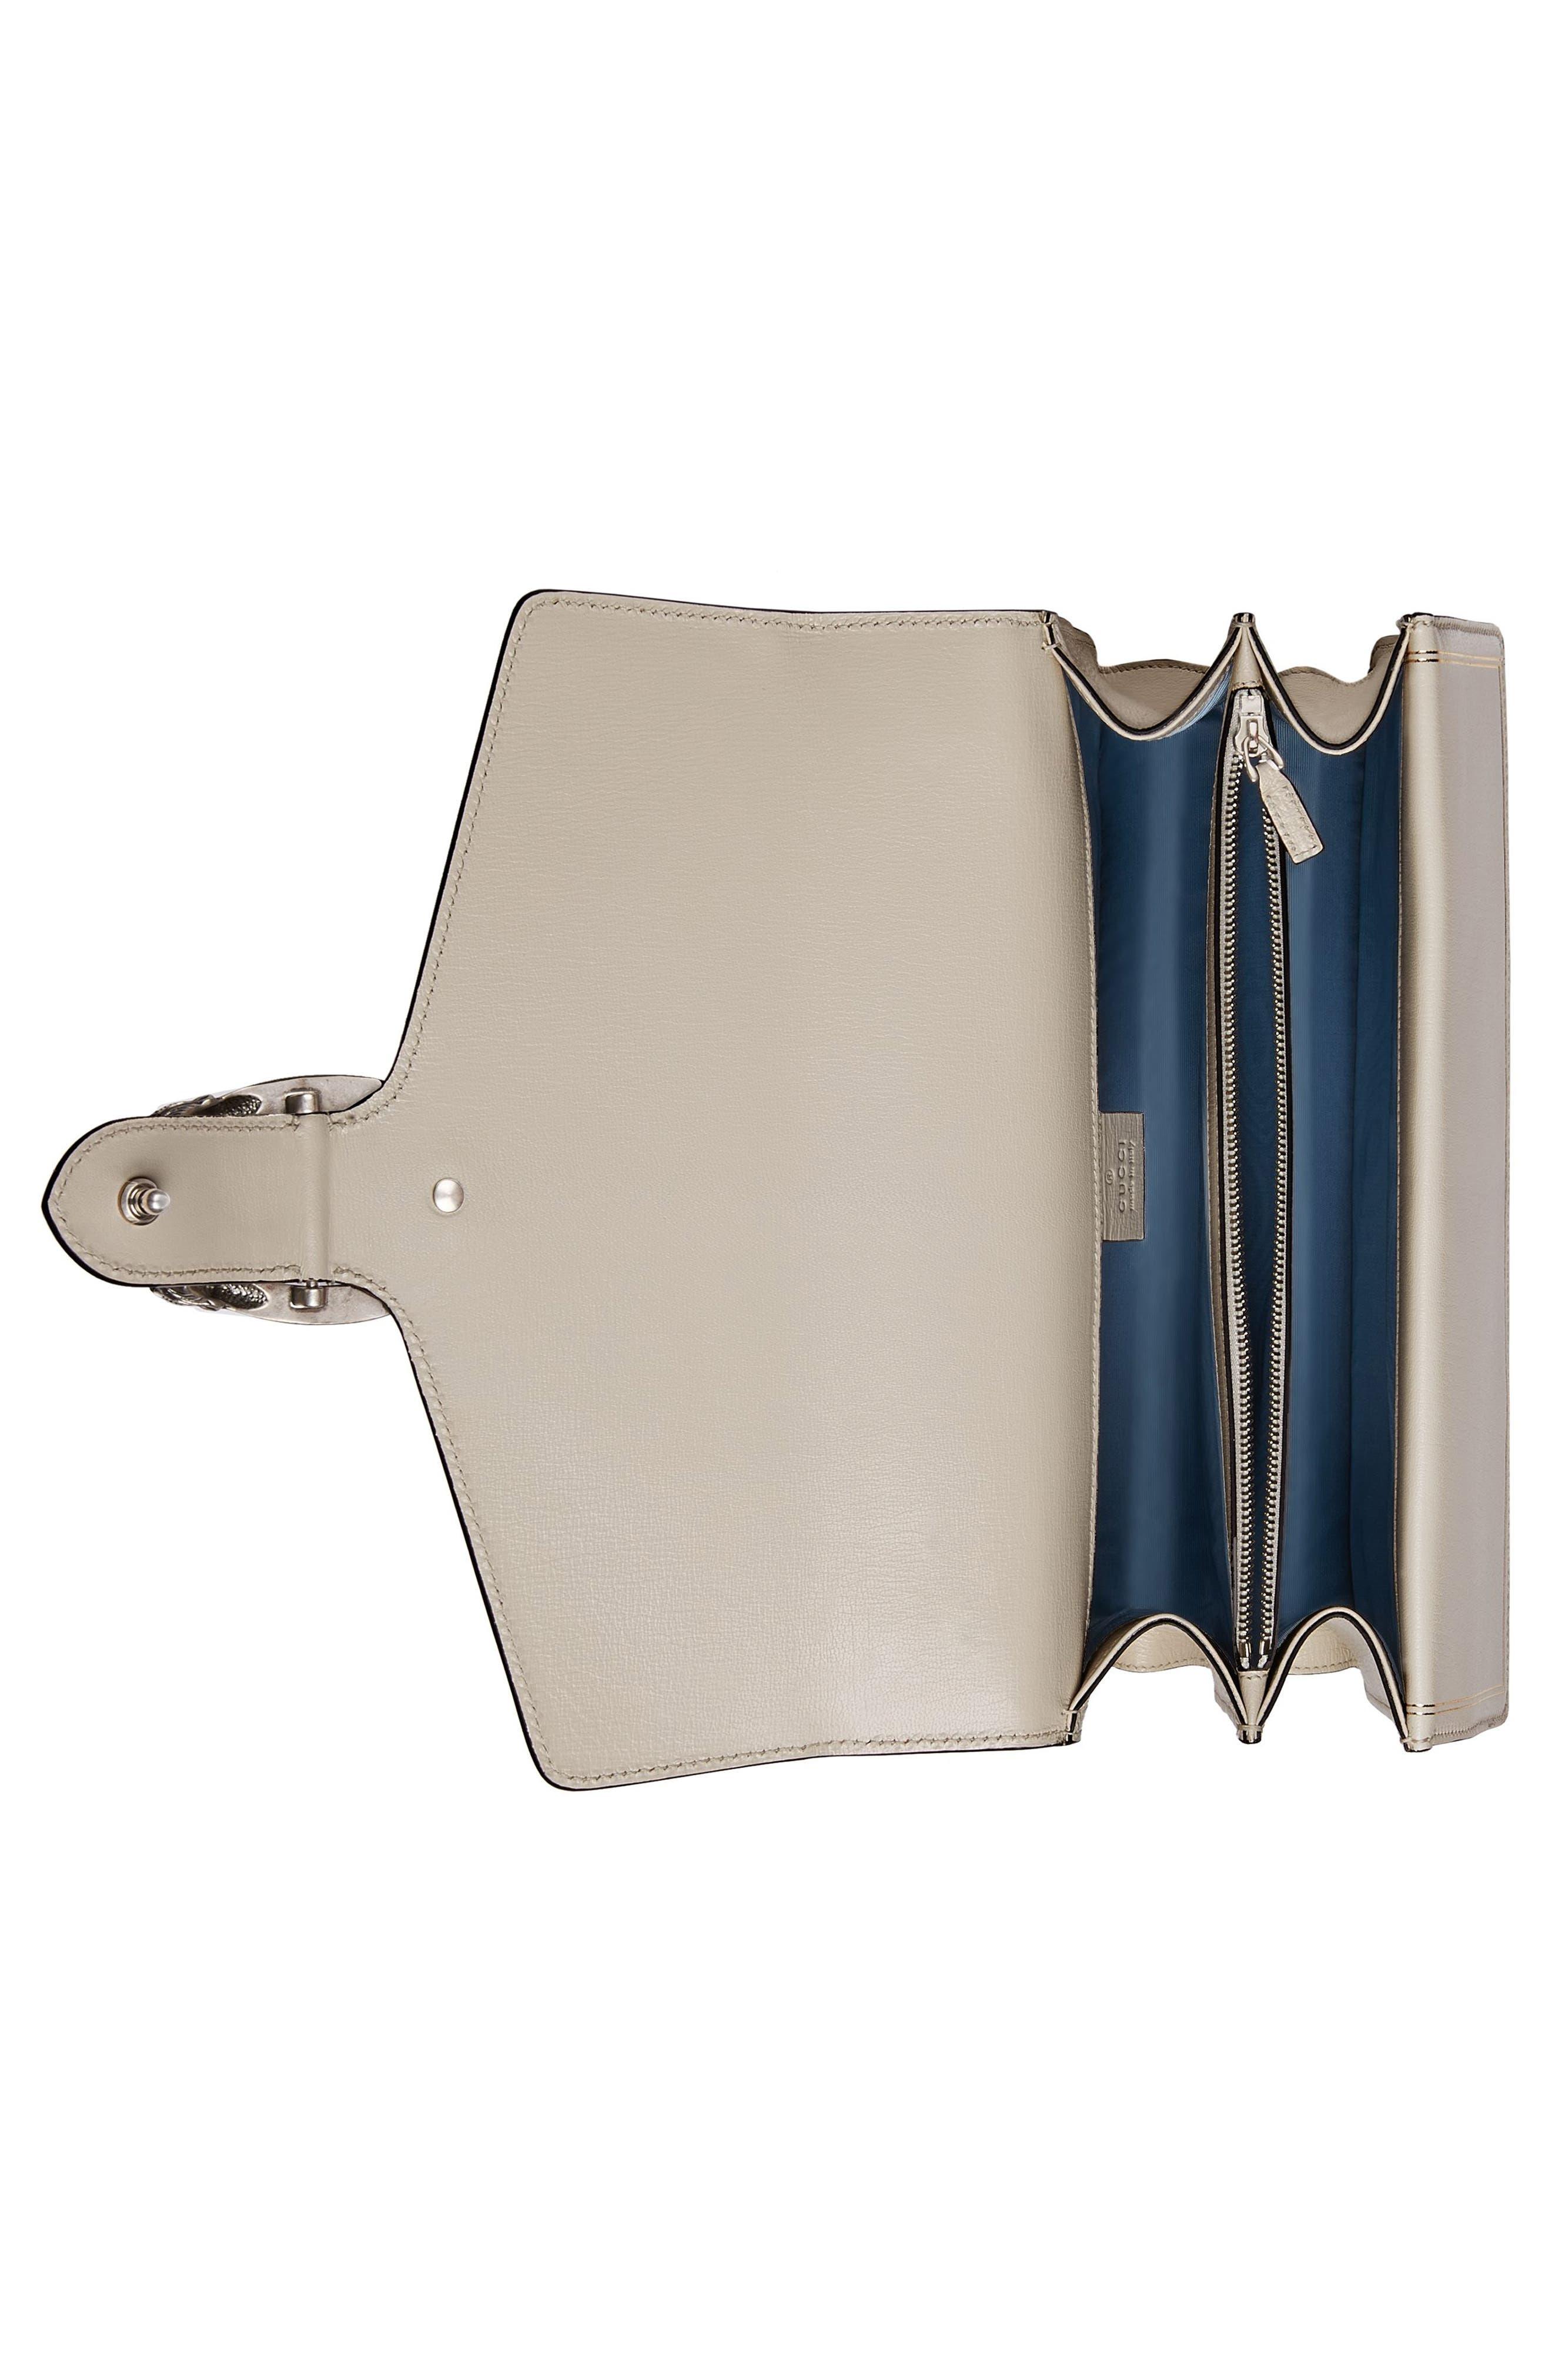 Dionysus Moon & Stars Leather Shoulder Bag,                             Alternate thumbnail 3, color,                             Mystic White/ Oro